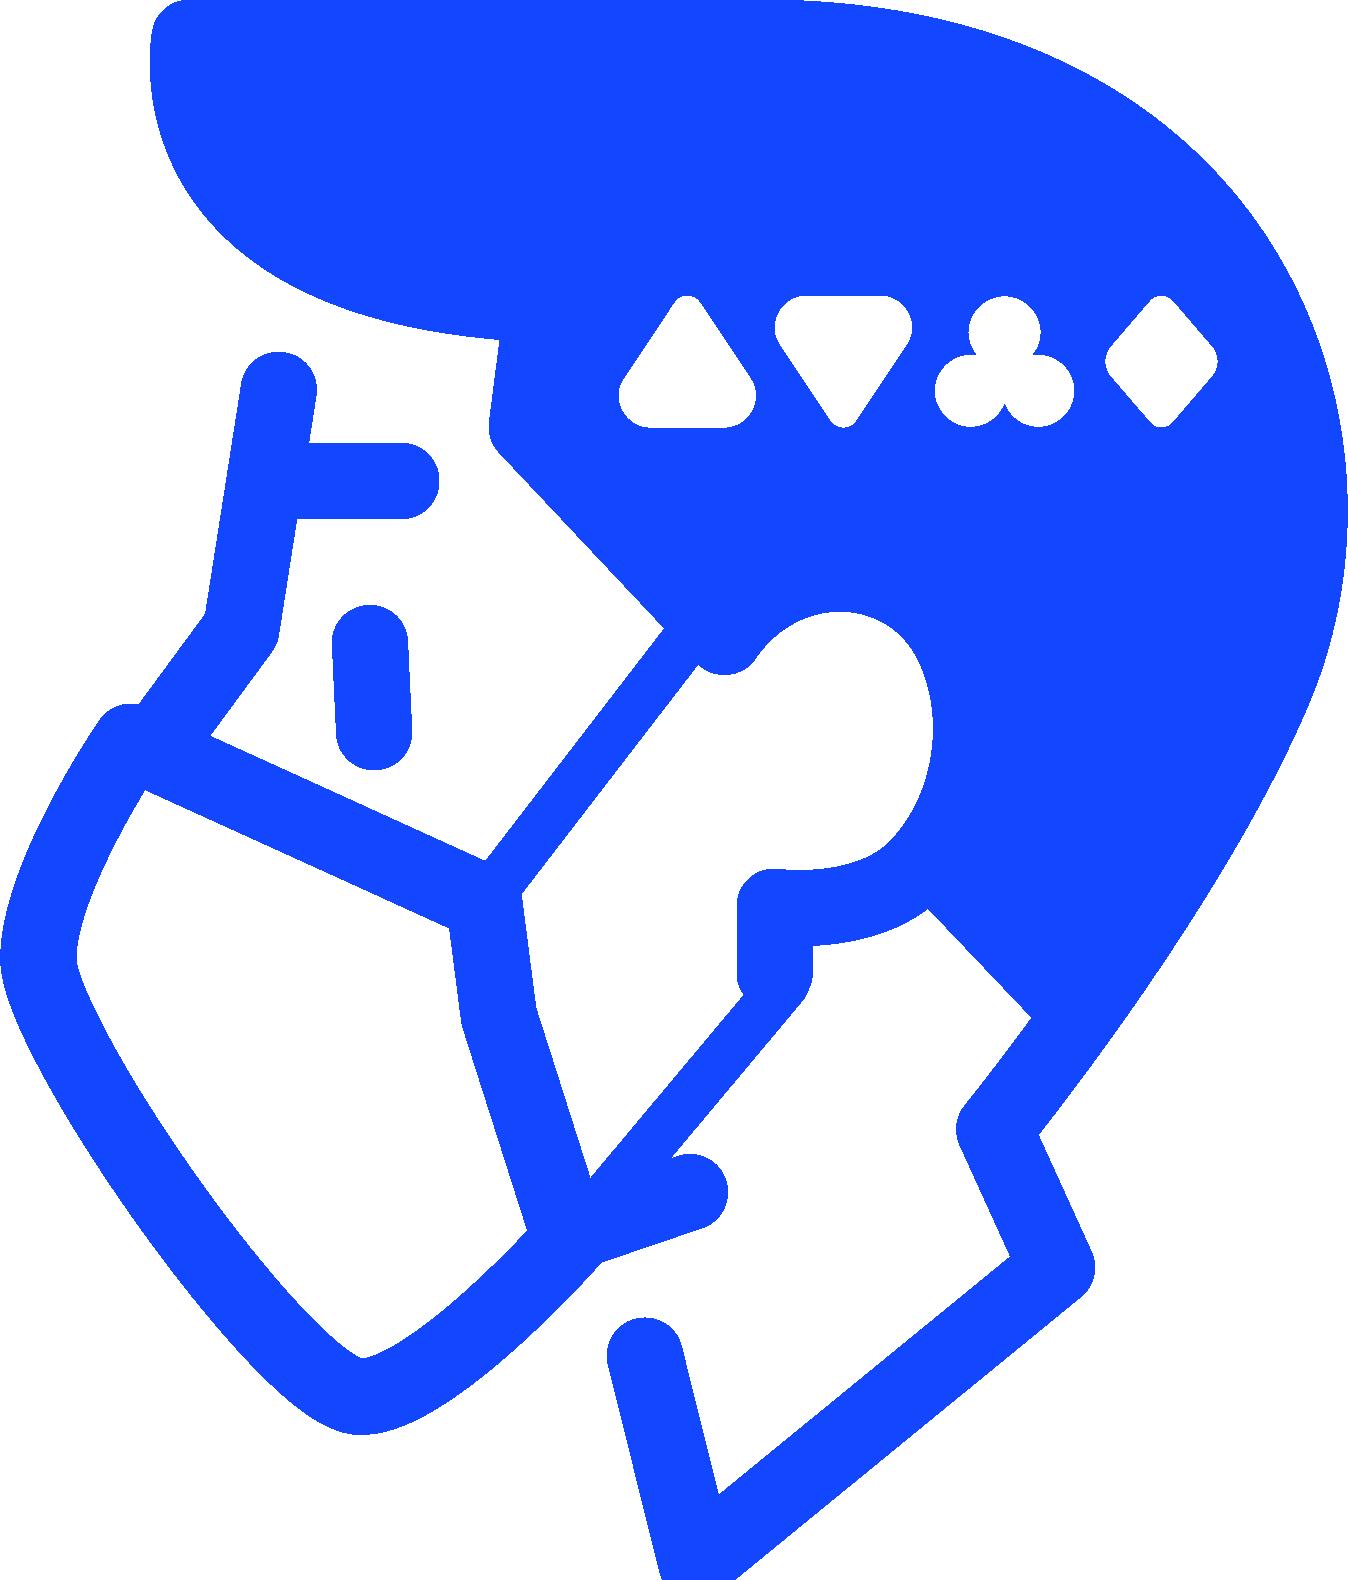 Ko Kawazoe